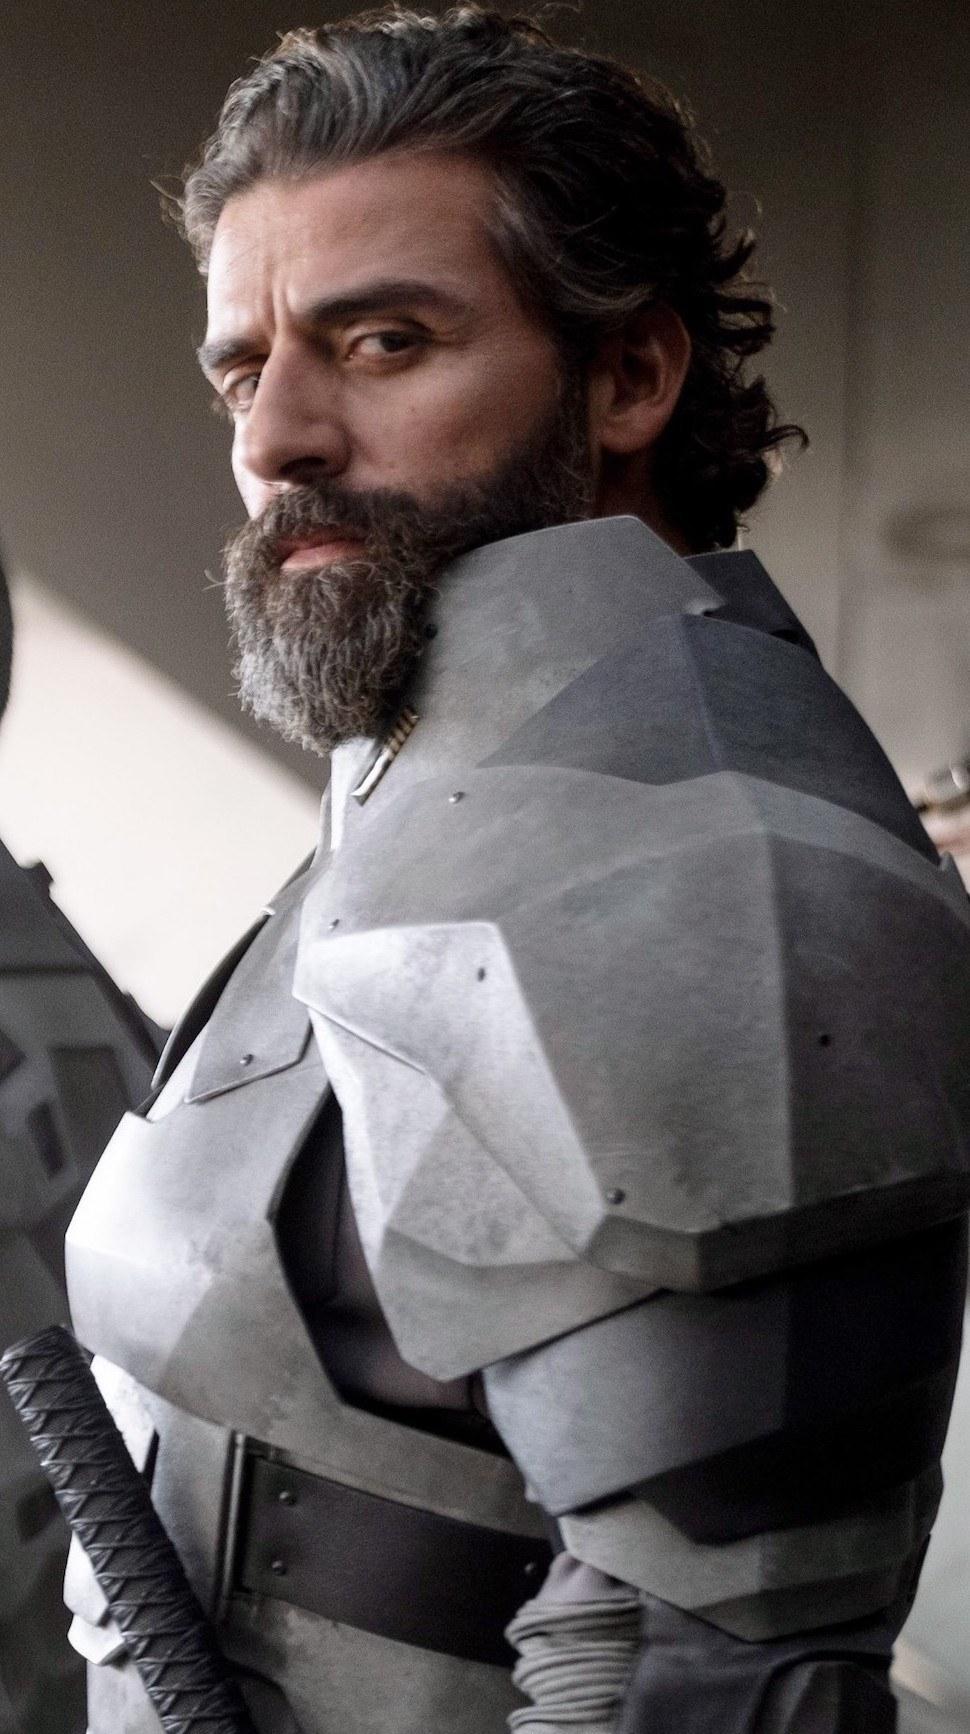 Oscar Isaac with long hair, a long beard, and wearing silver armor